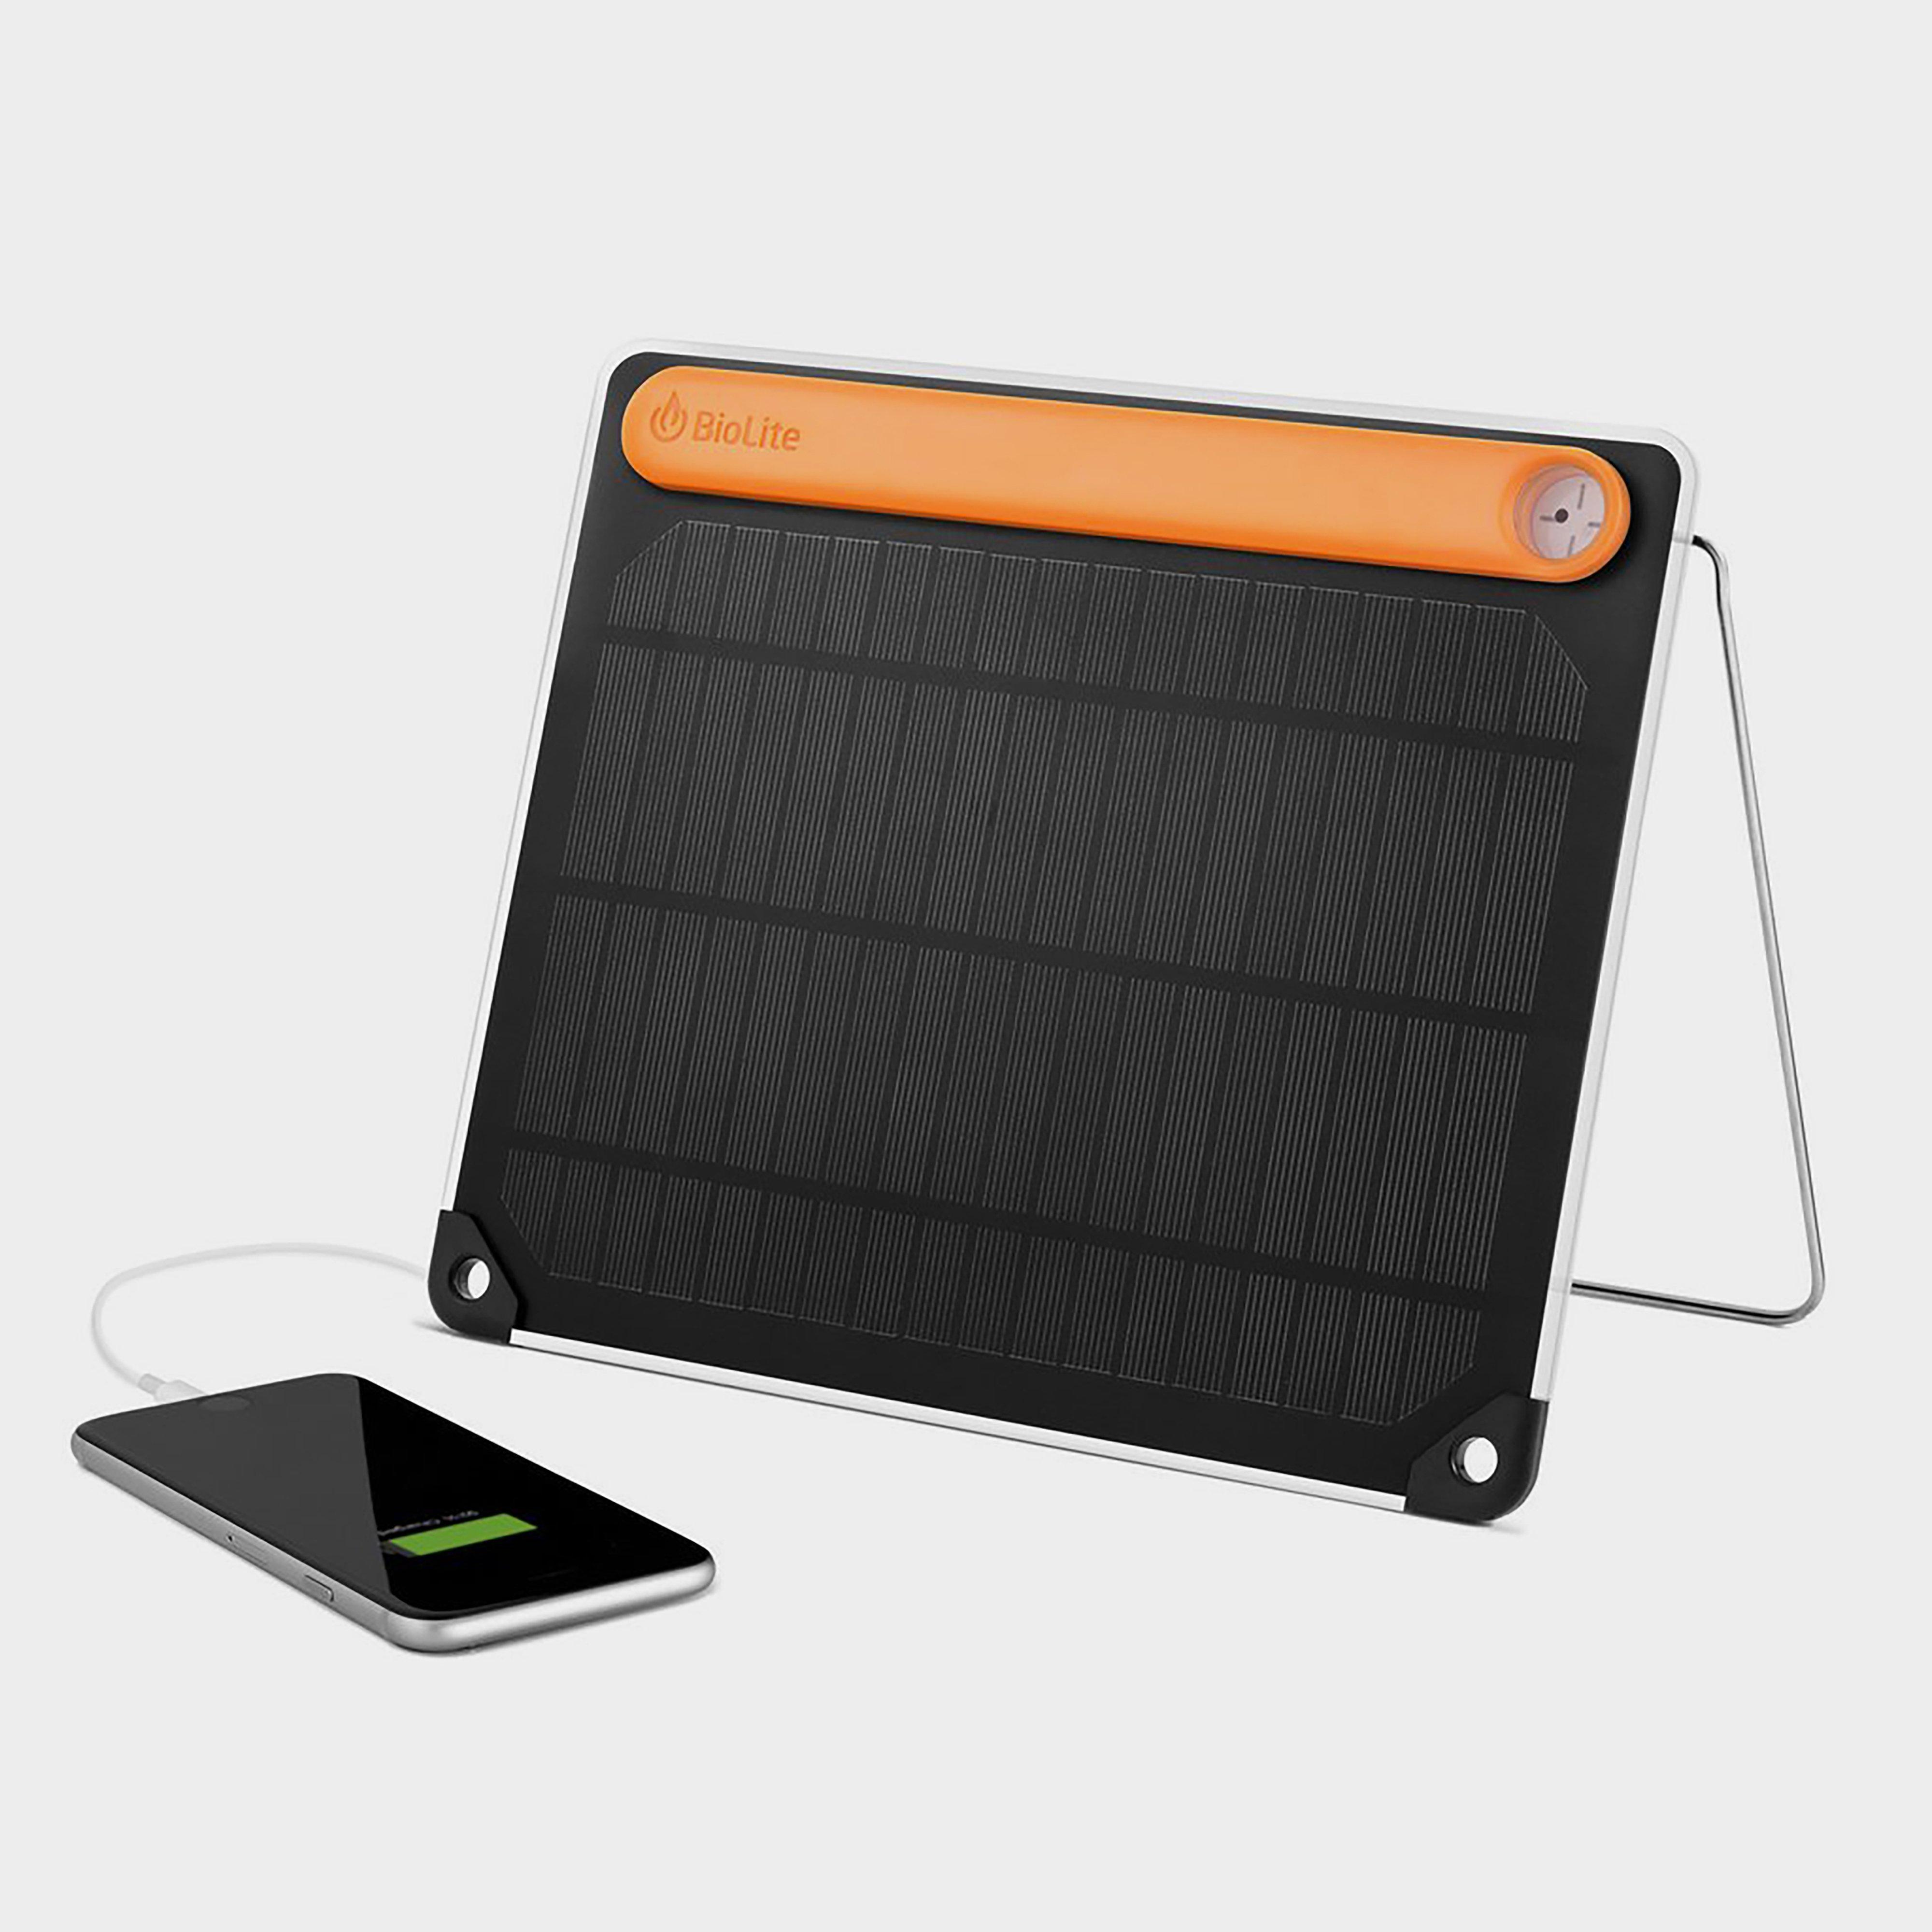 Biolite Solarpanel - Black/orange  Black/orange